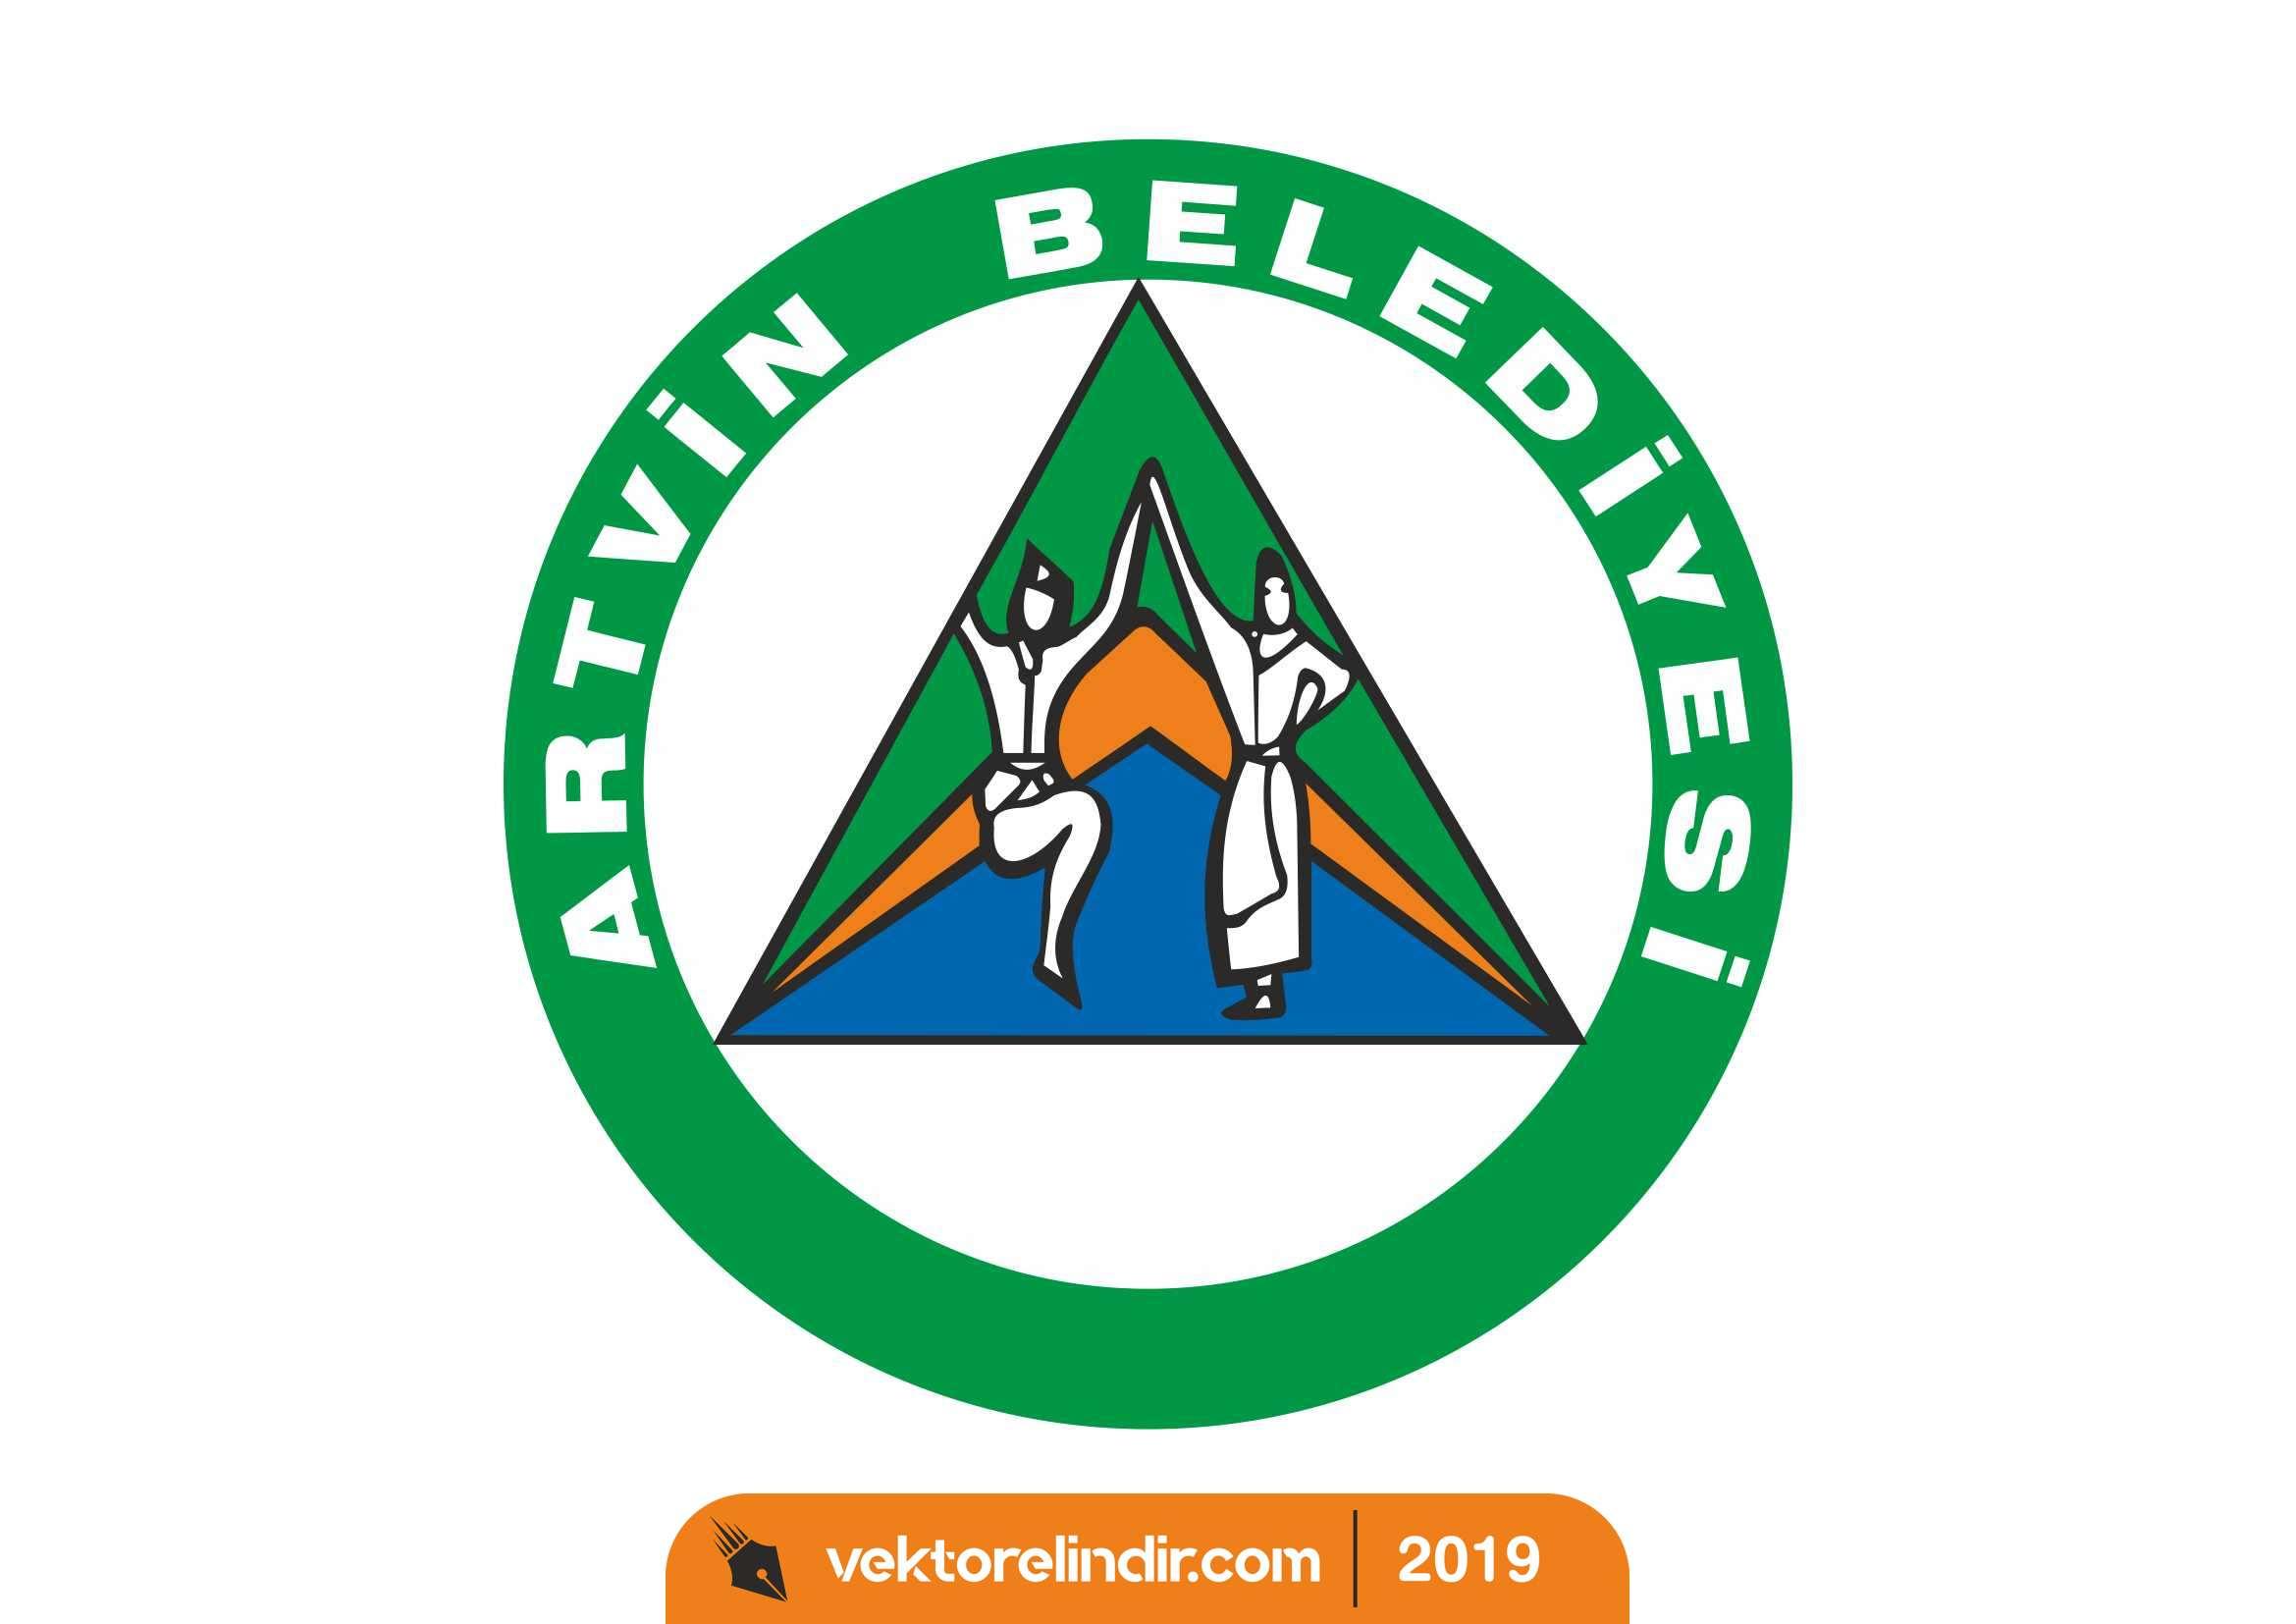 Artvin Belediyesi Logo, Amblem